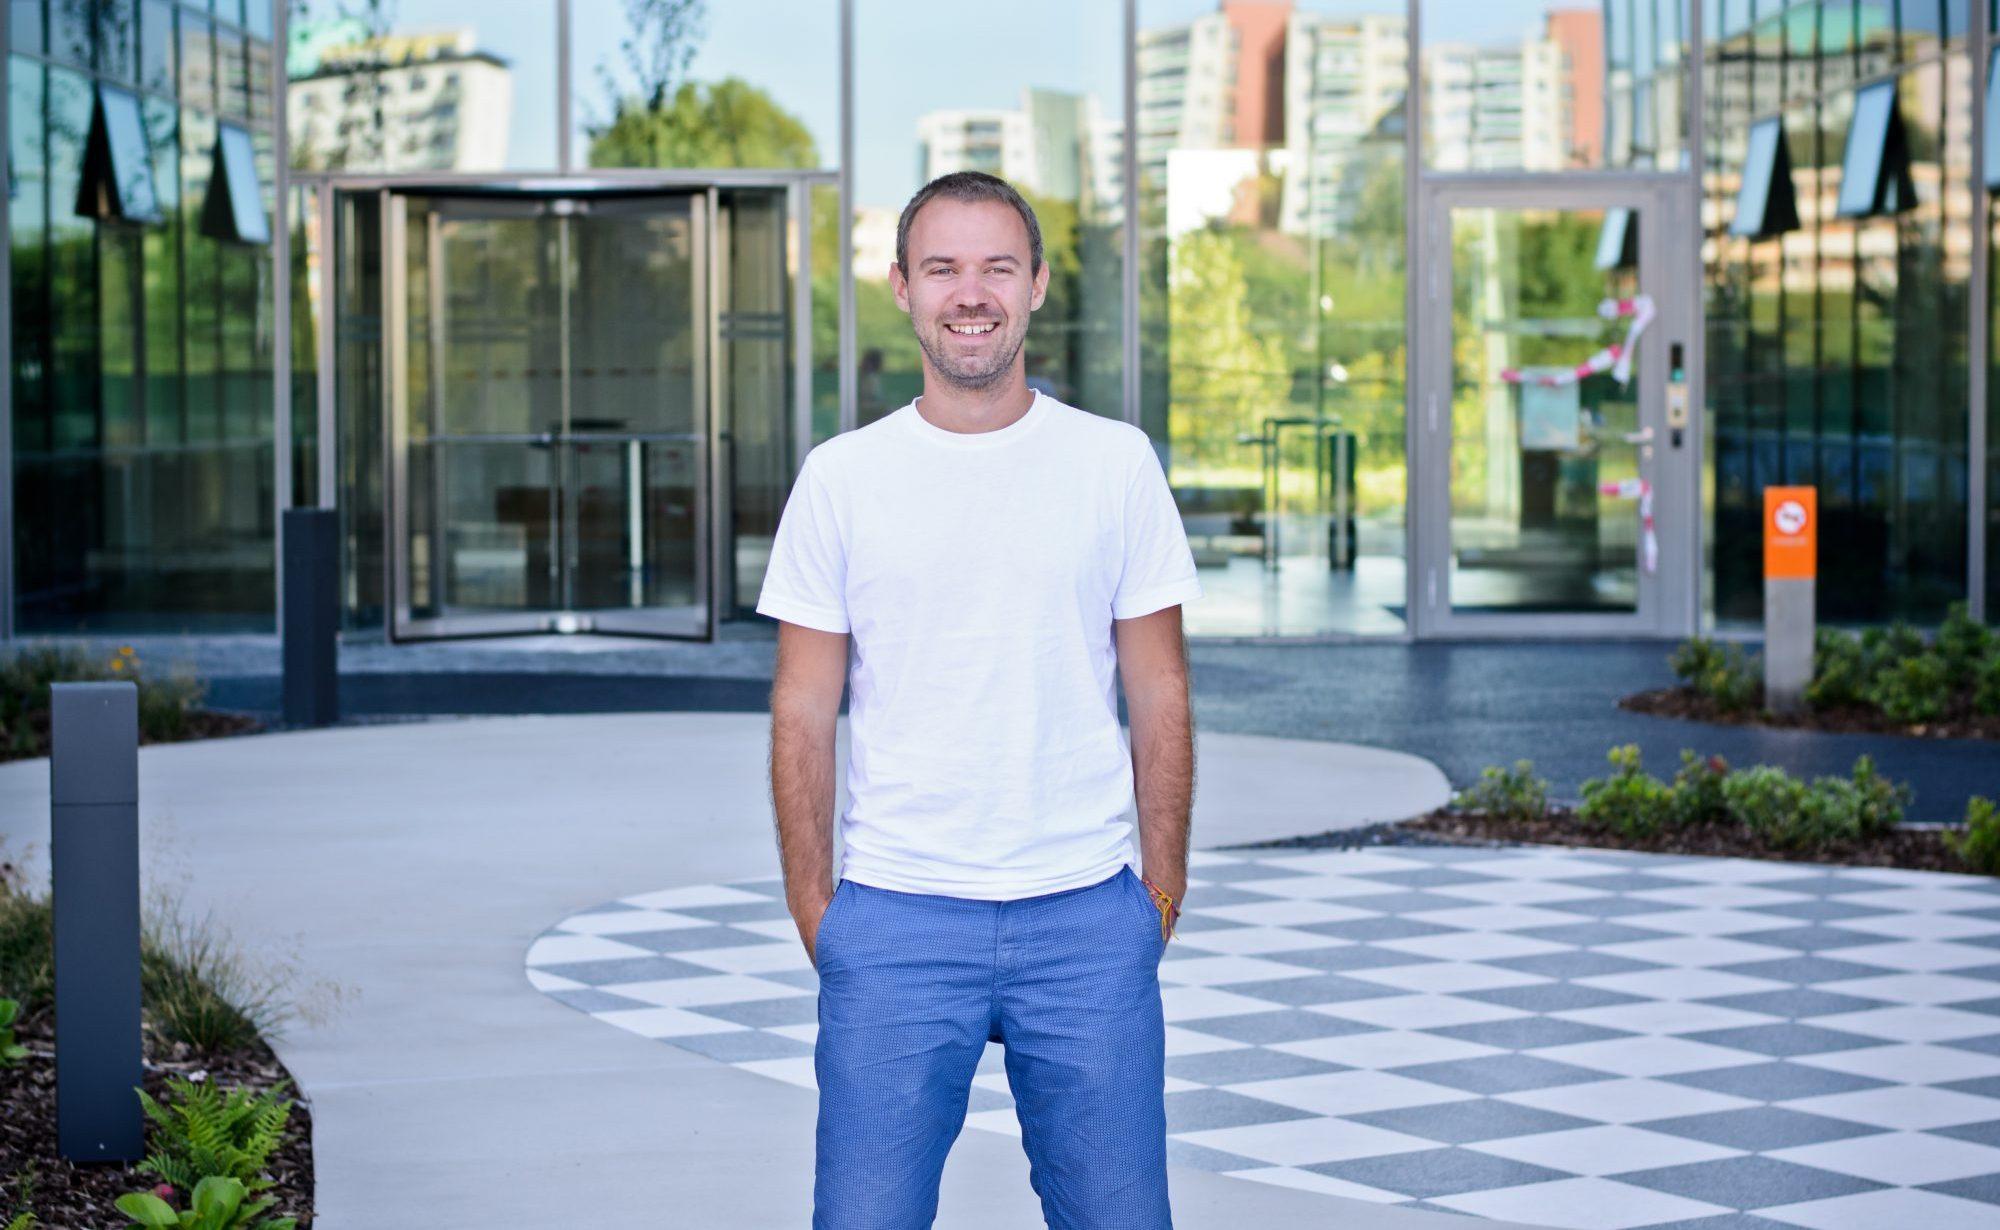 Zakladatel Kiwi.com, Oliver Dlouhý